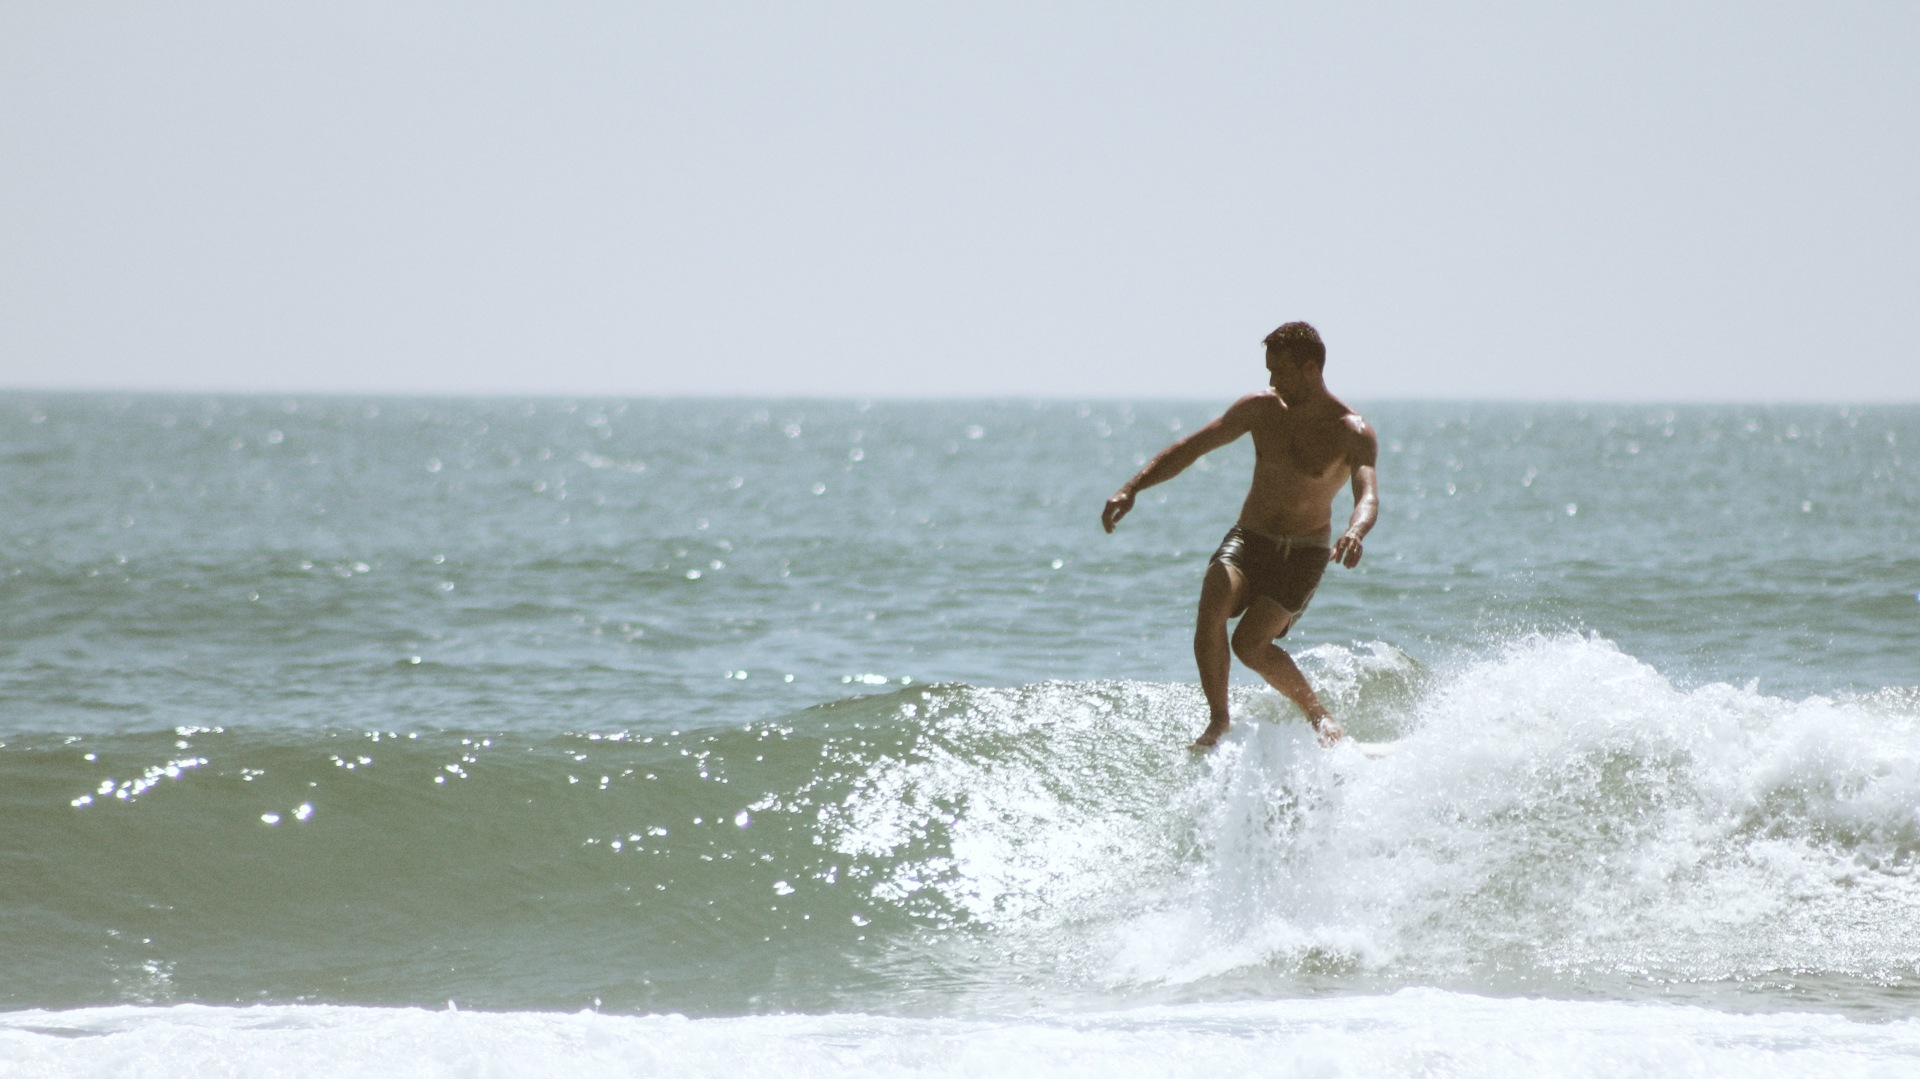 Fabricio-zanella-longboard-siebert-surfboards